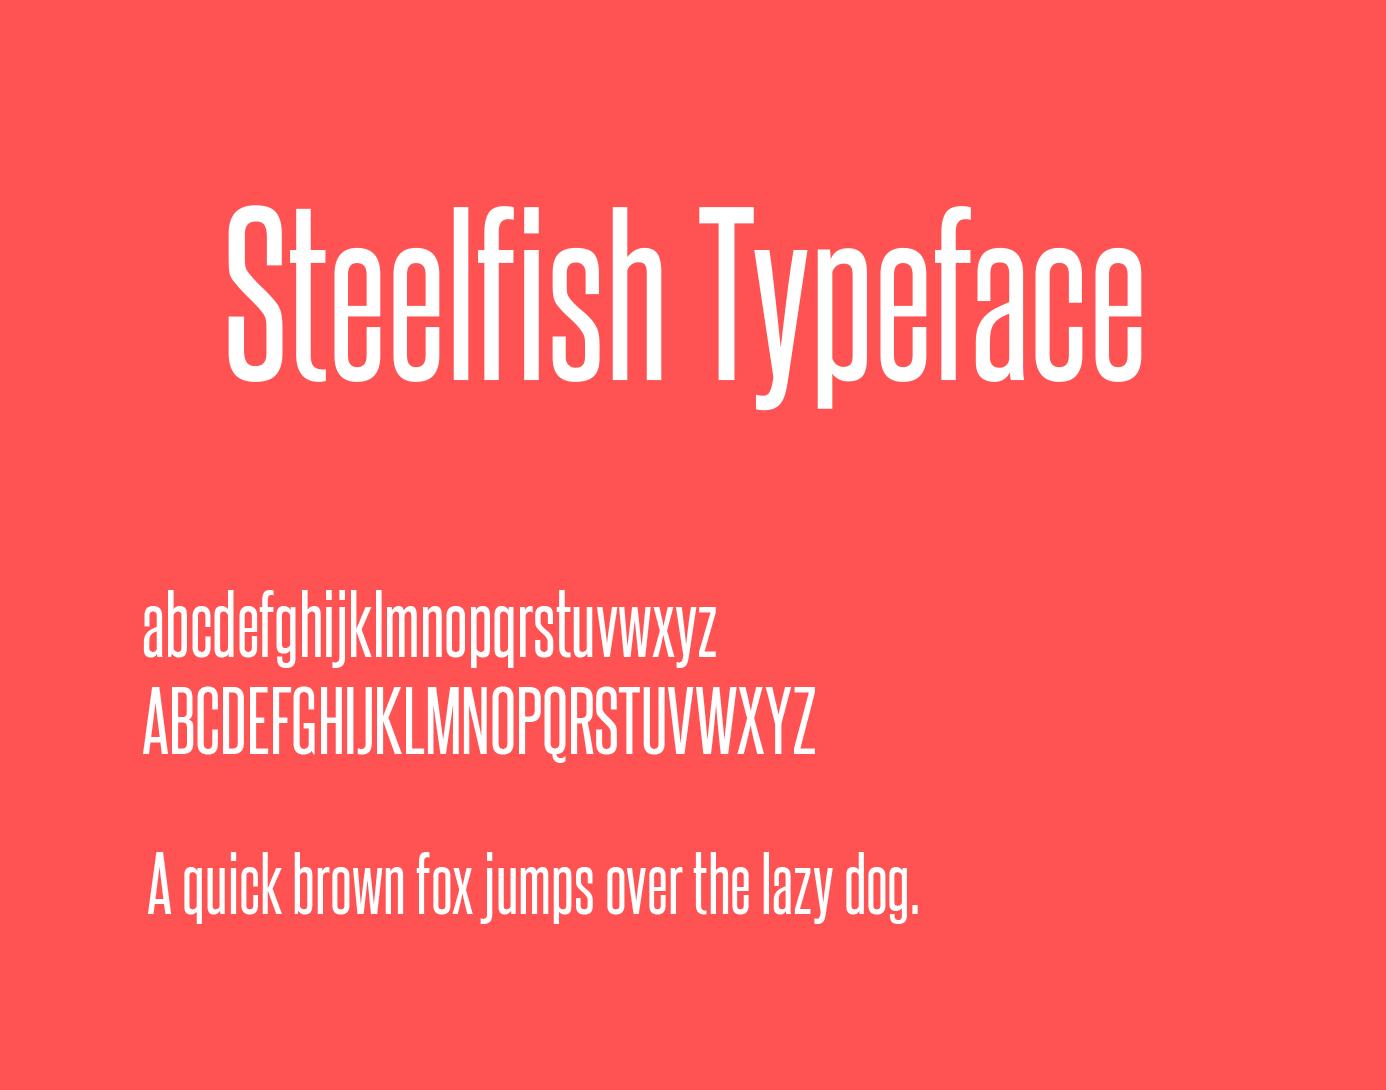 https://fontclarity.com/wp-content/uploads/2019/09/steelfish-font-download-0.png Free Download